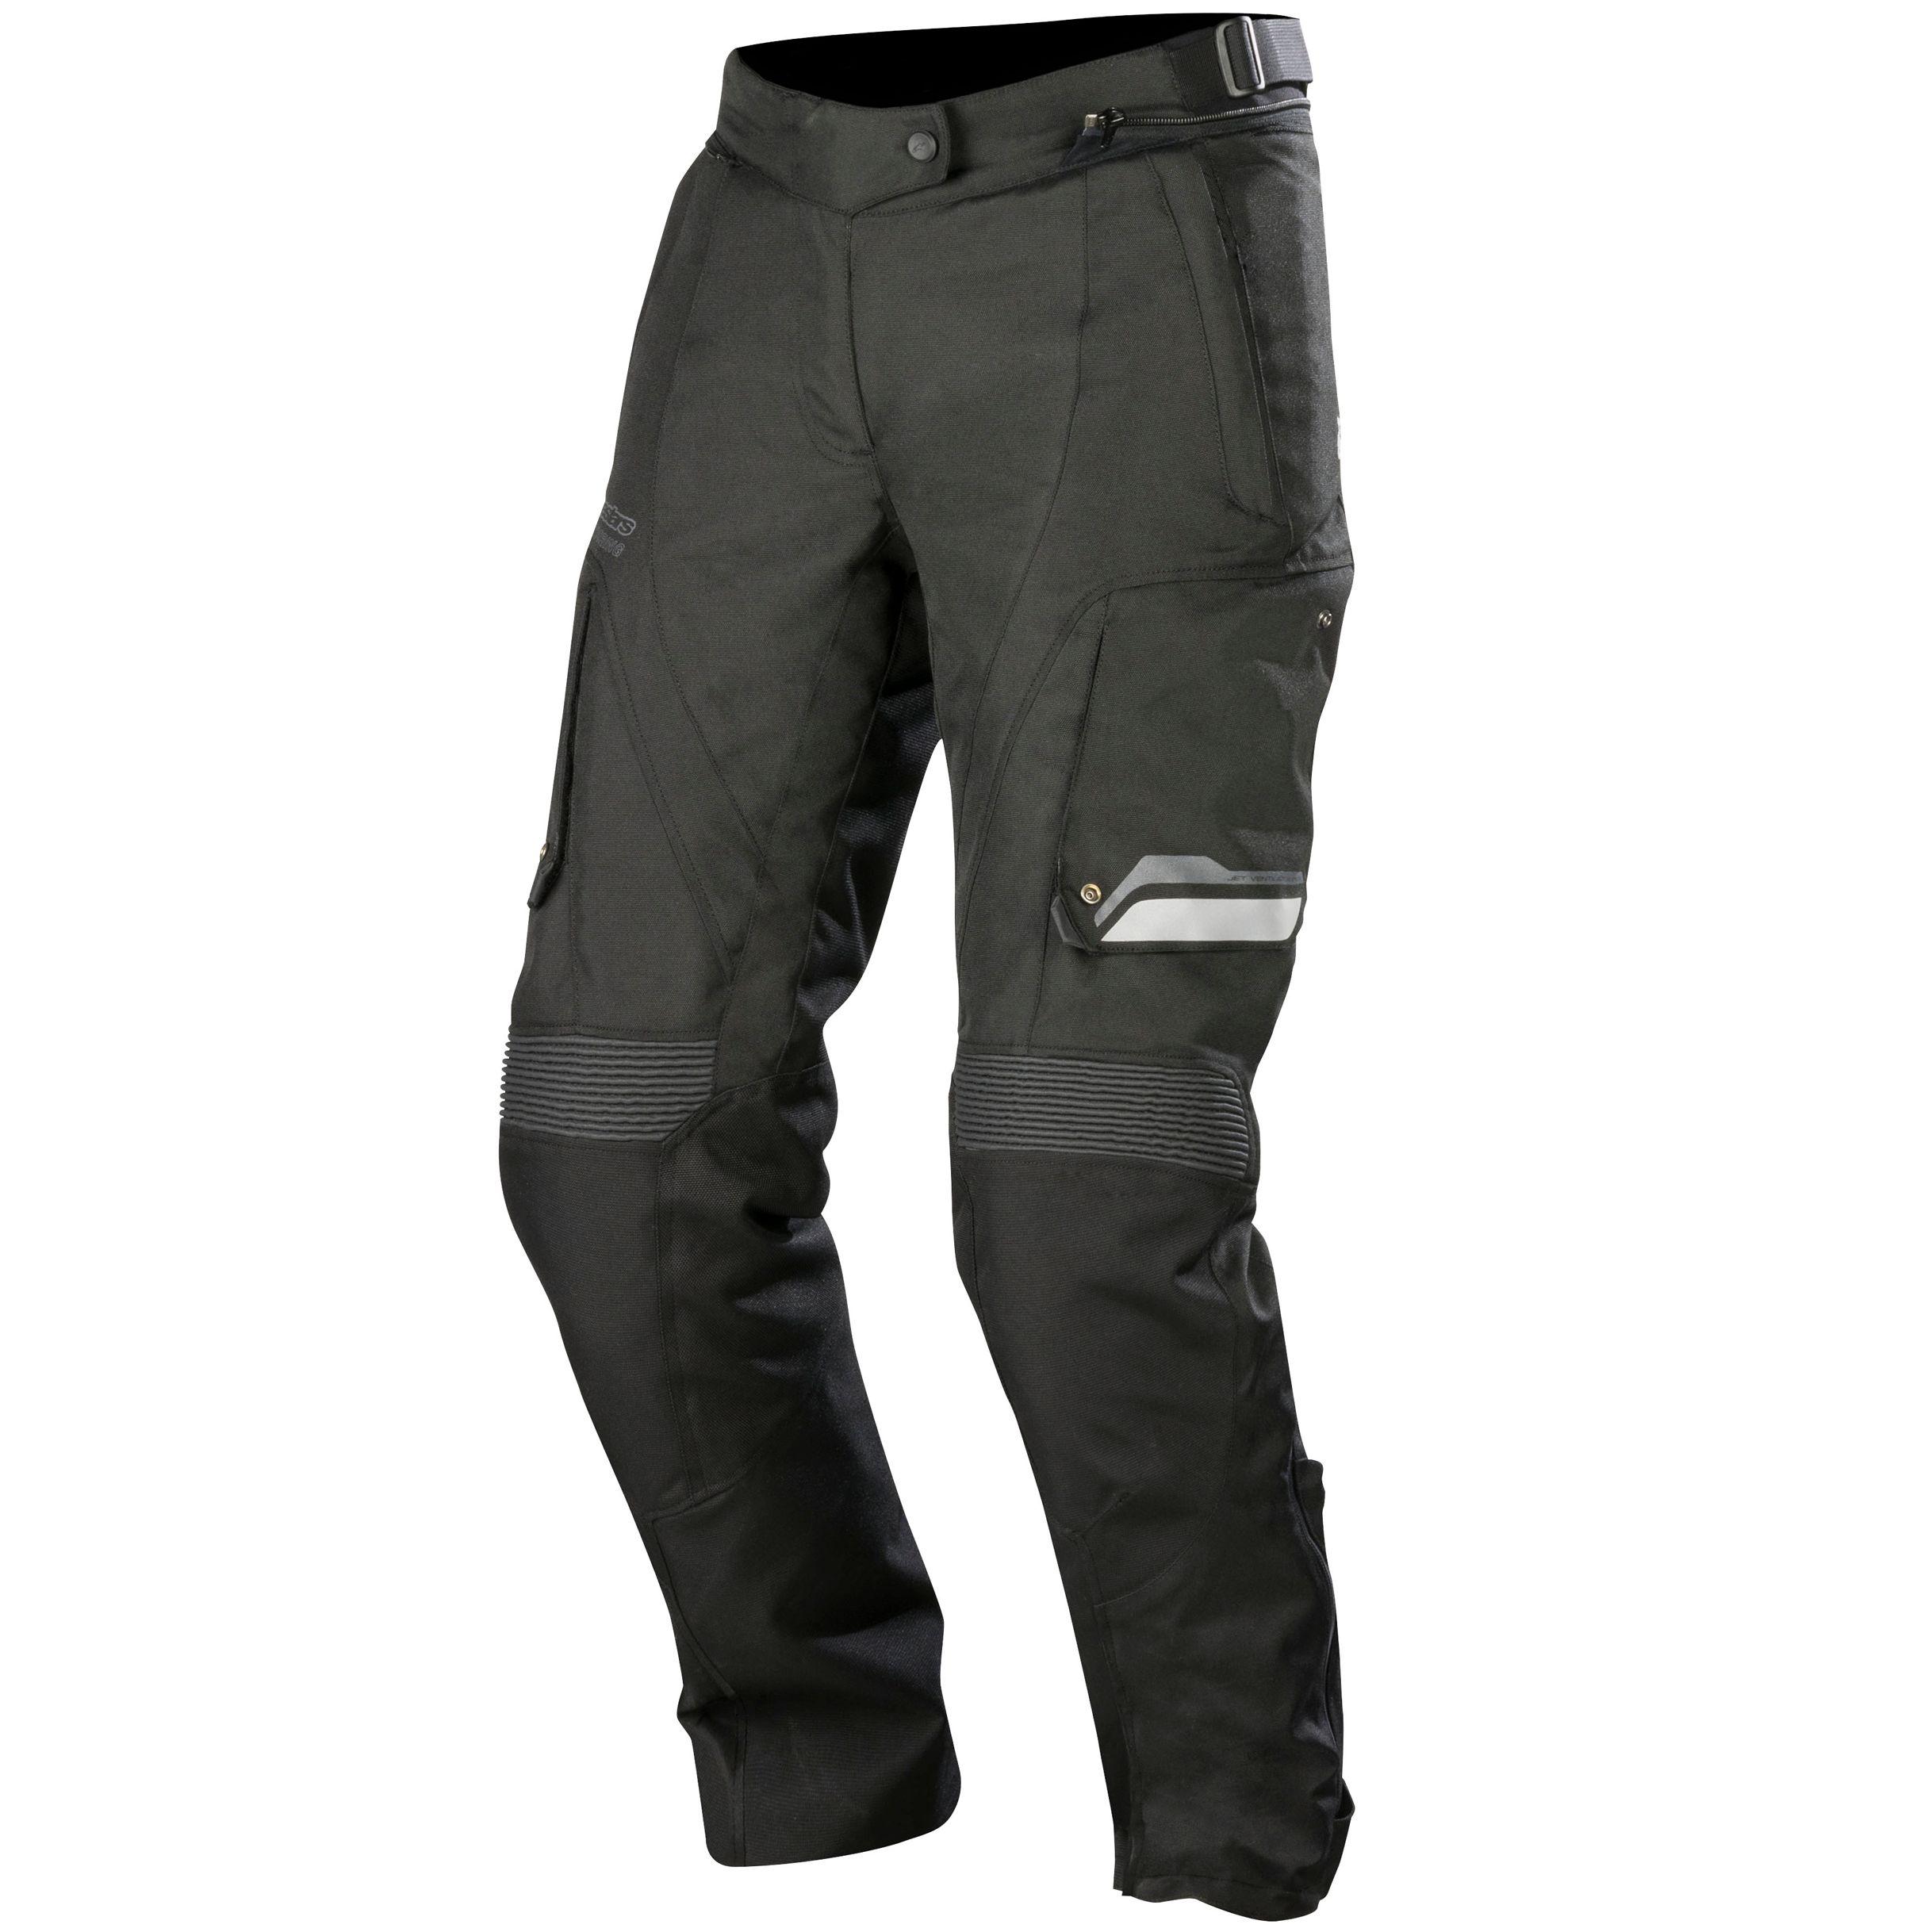 Pantalon Alpinestars Stella Bogota V2 Drystar